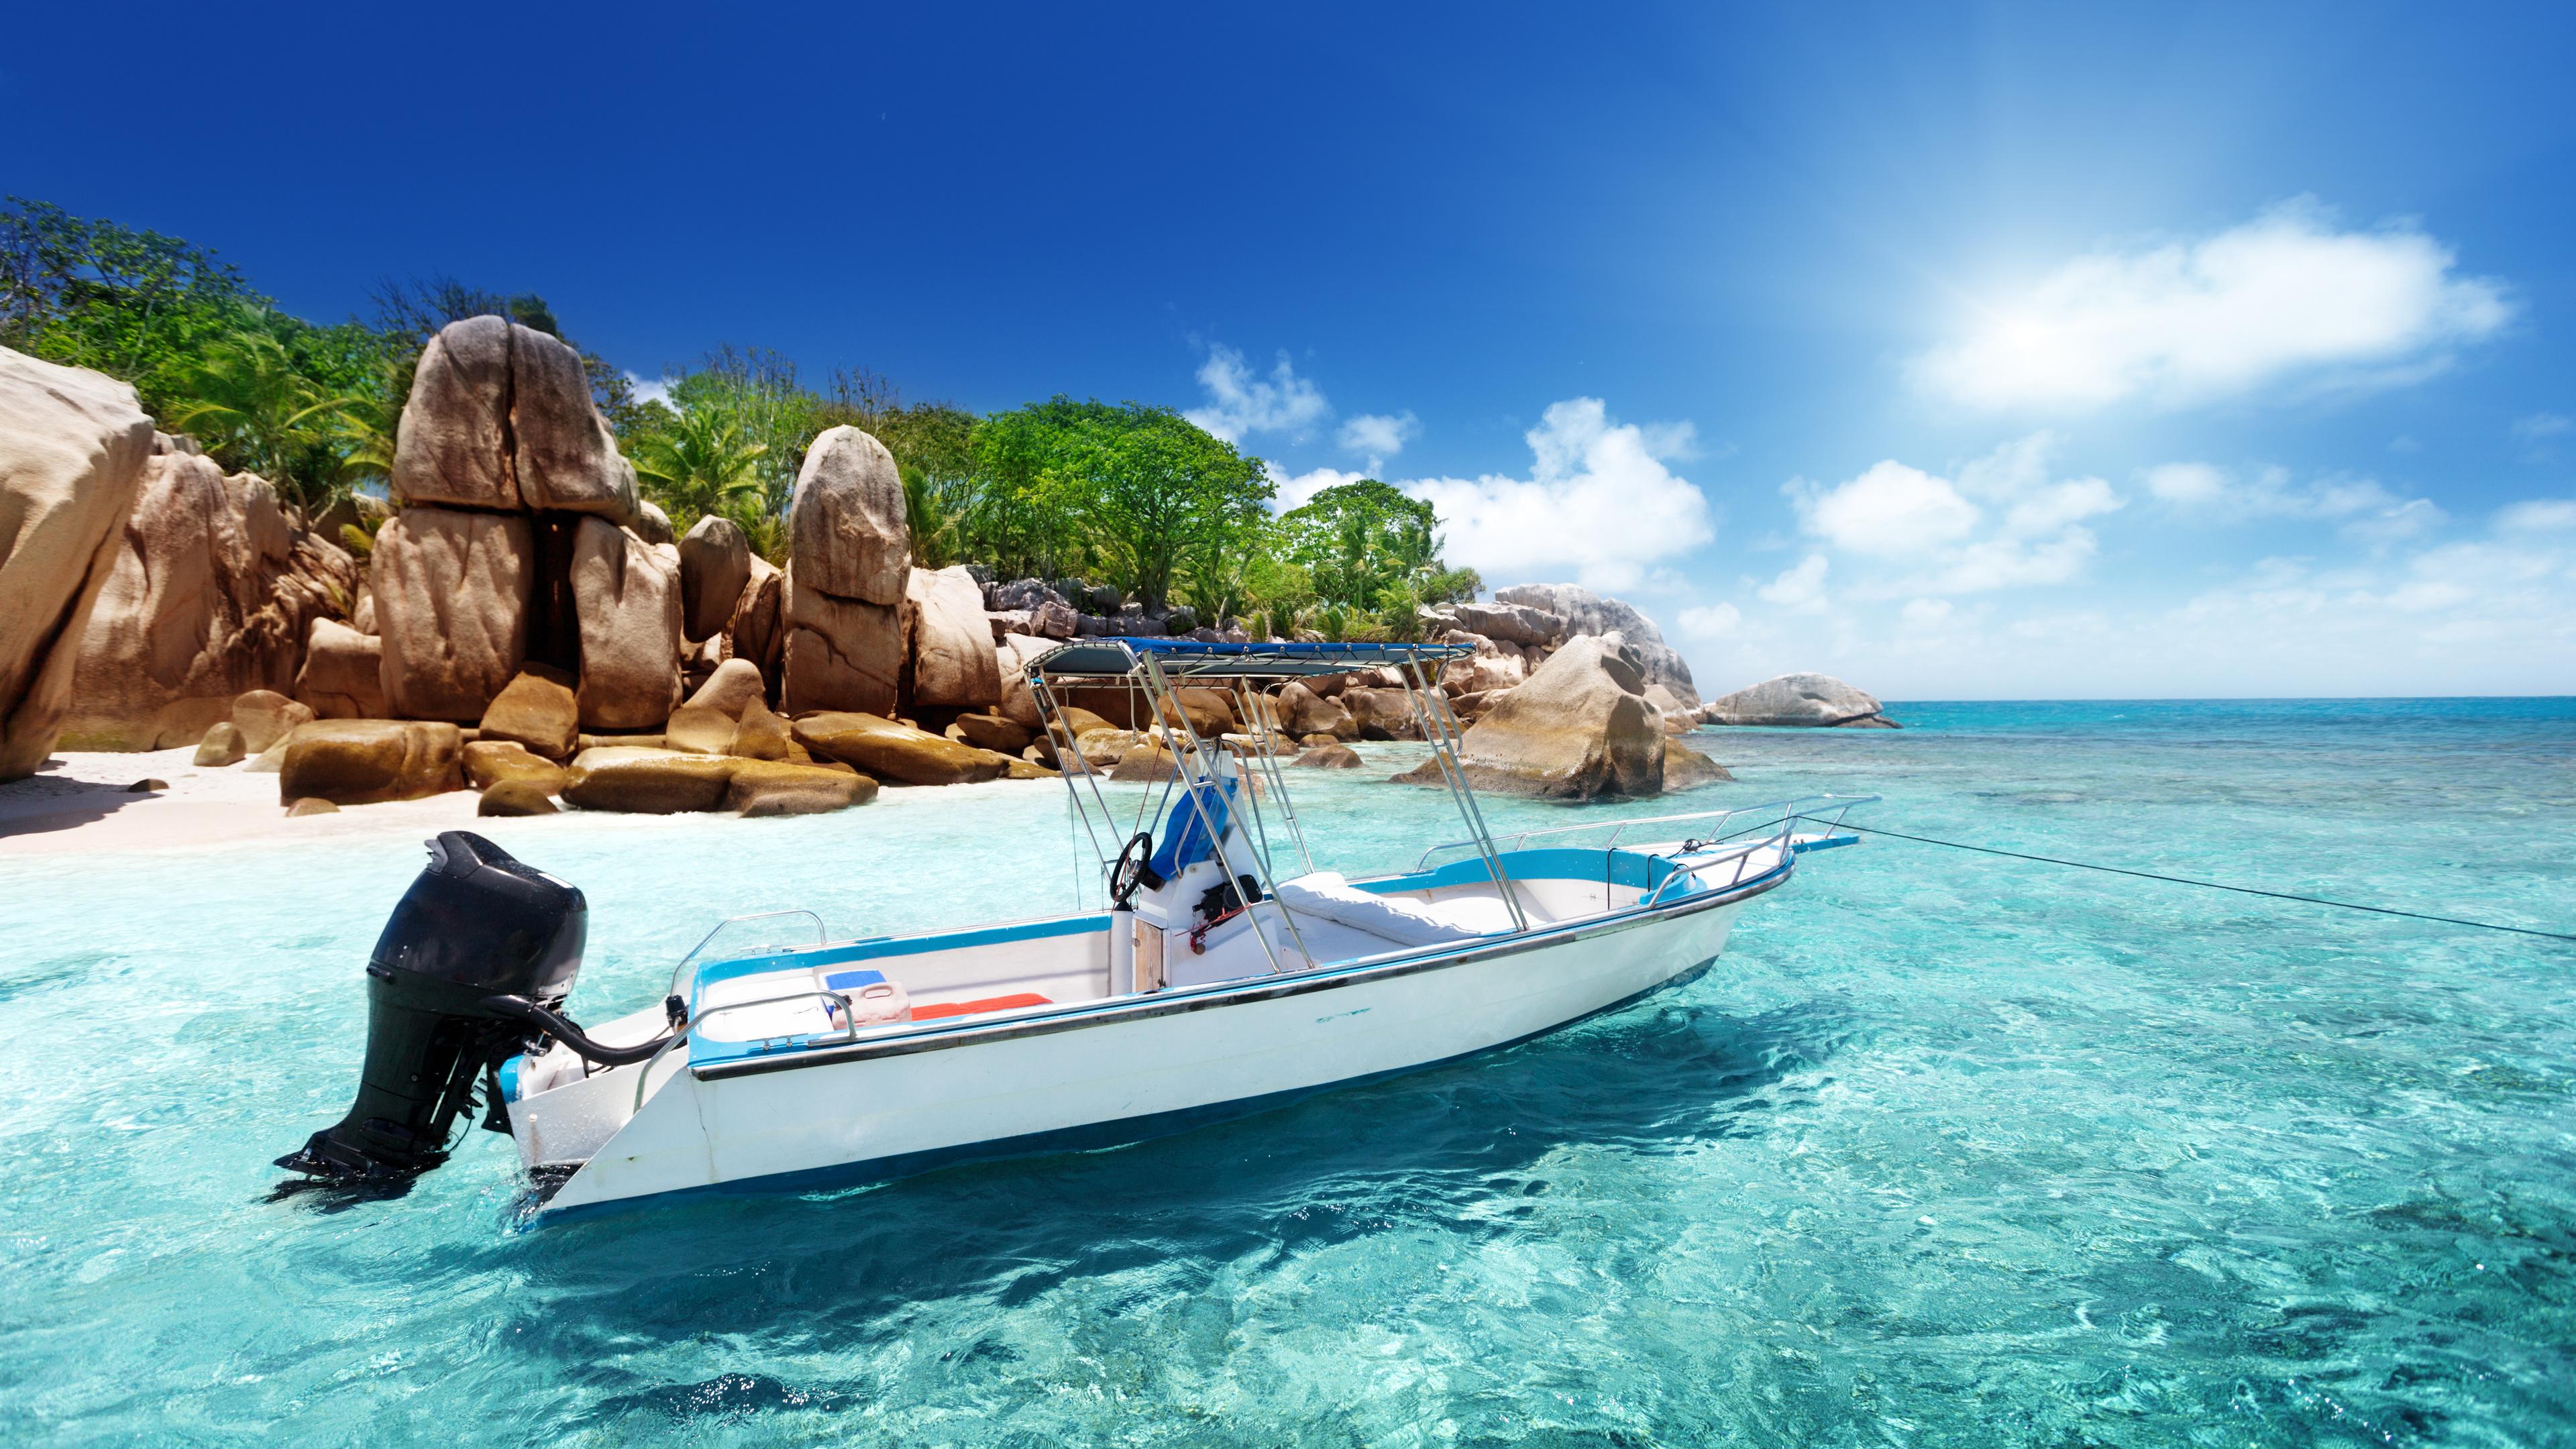 Download Wallpaper High Resolution Ocean - 4K-Ocean-Wallpaper-High-Resolution  Image_488160.jpeg